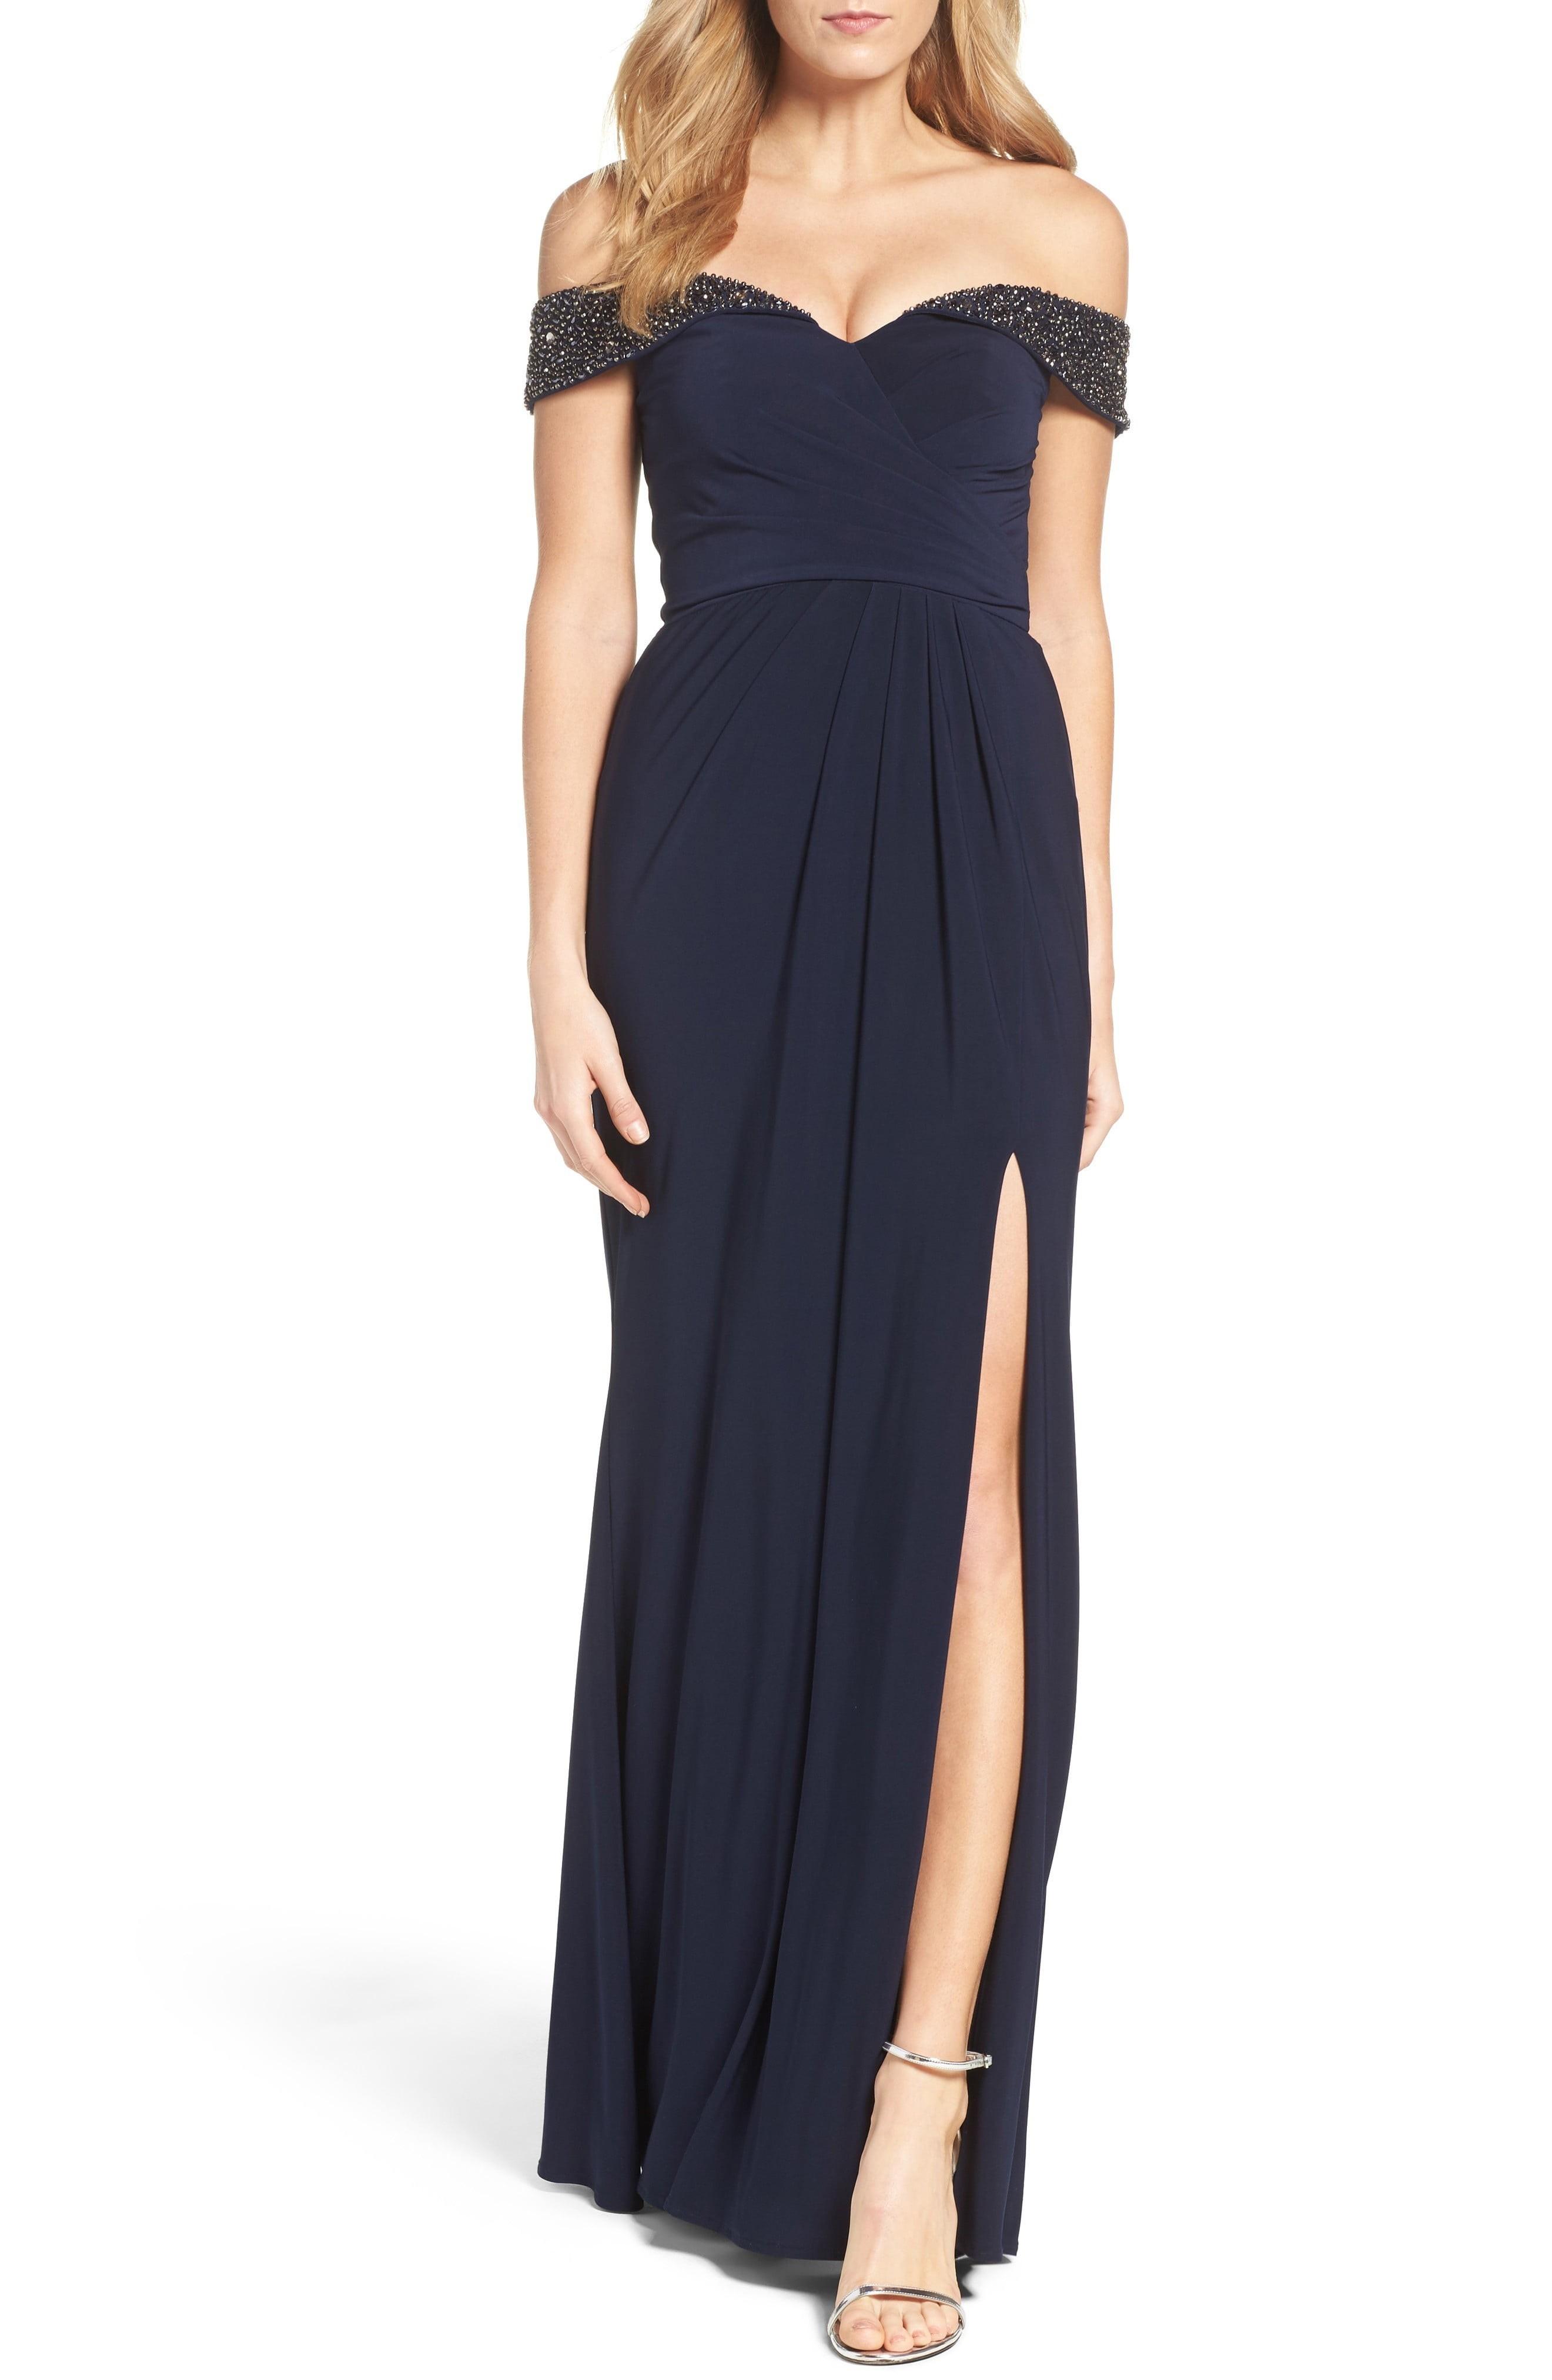 Dark blue bridesmaid dresses navy blue bridesmaid dresses nordstrom ombrellifo Choice Image